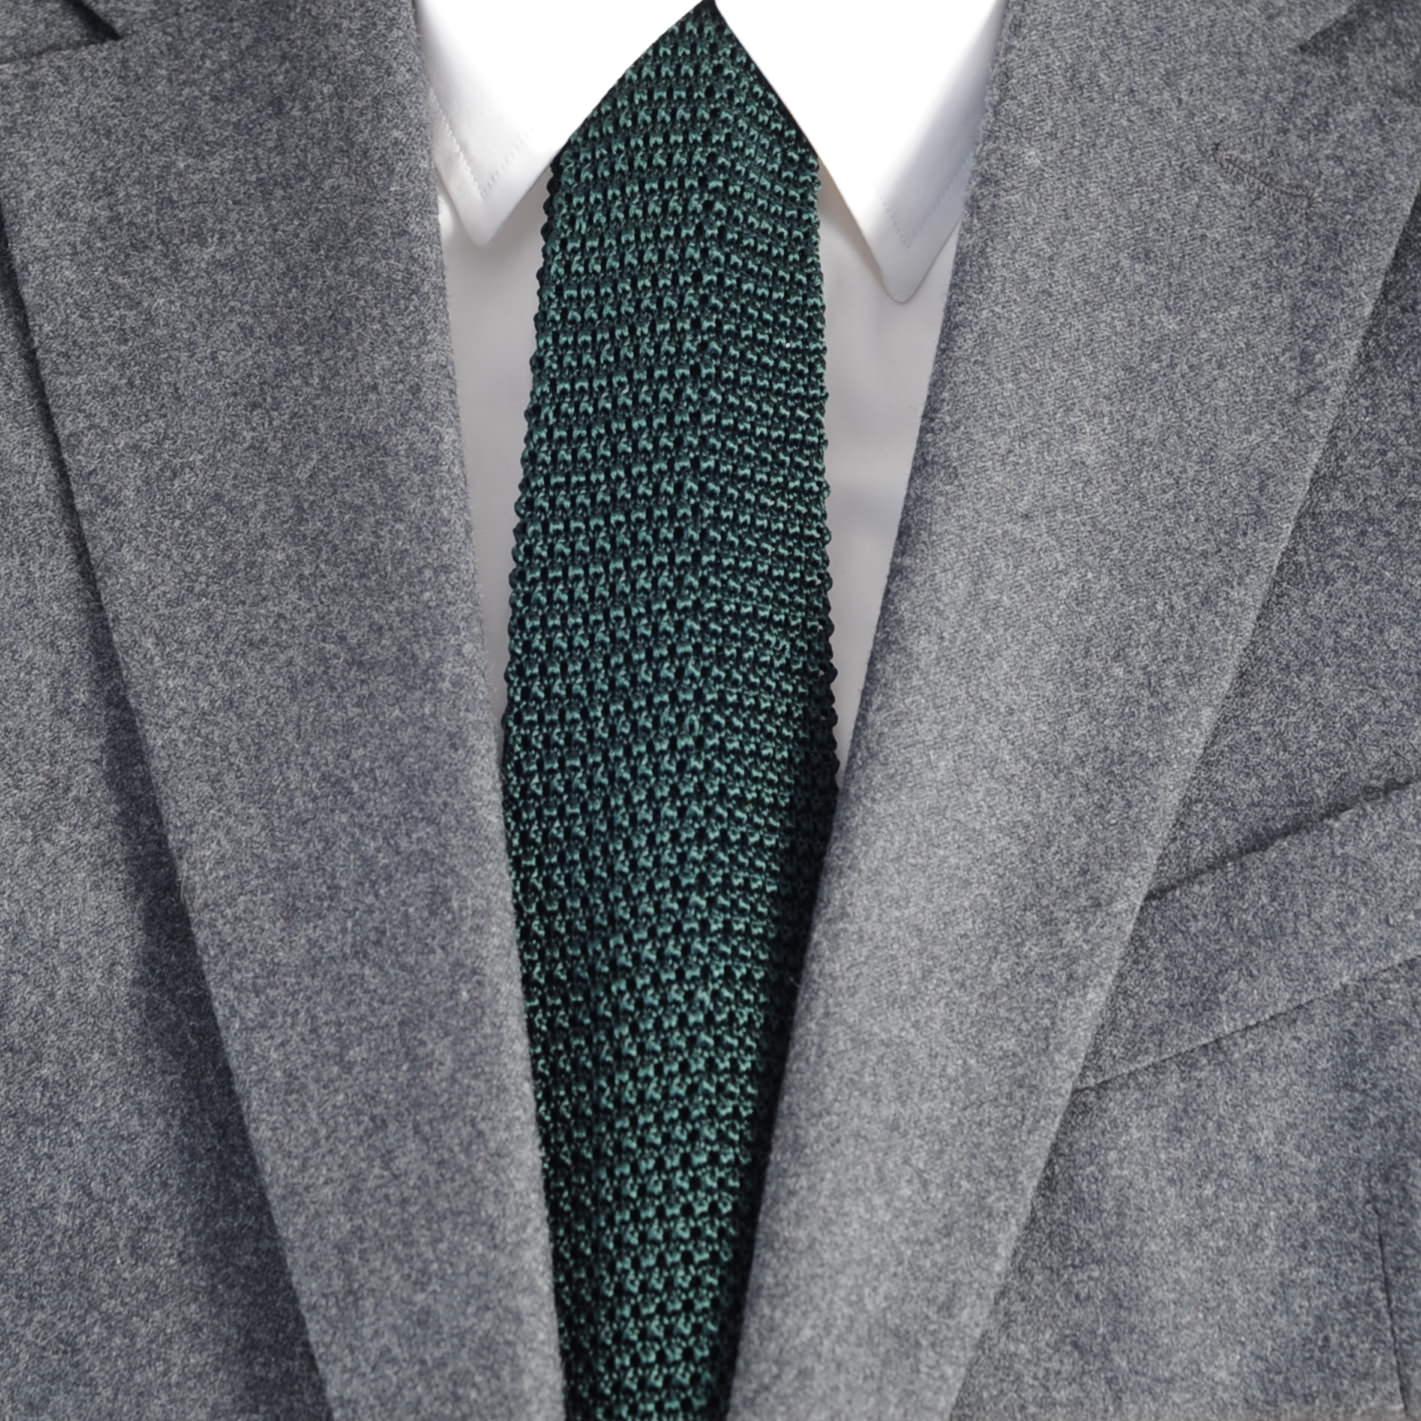 Cravate soie tricot vert fonc costume gris verygoodlord blog mode homme et conseils mode - Costume gris fonce ...